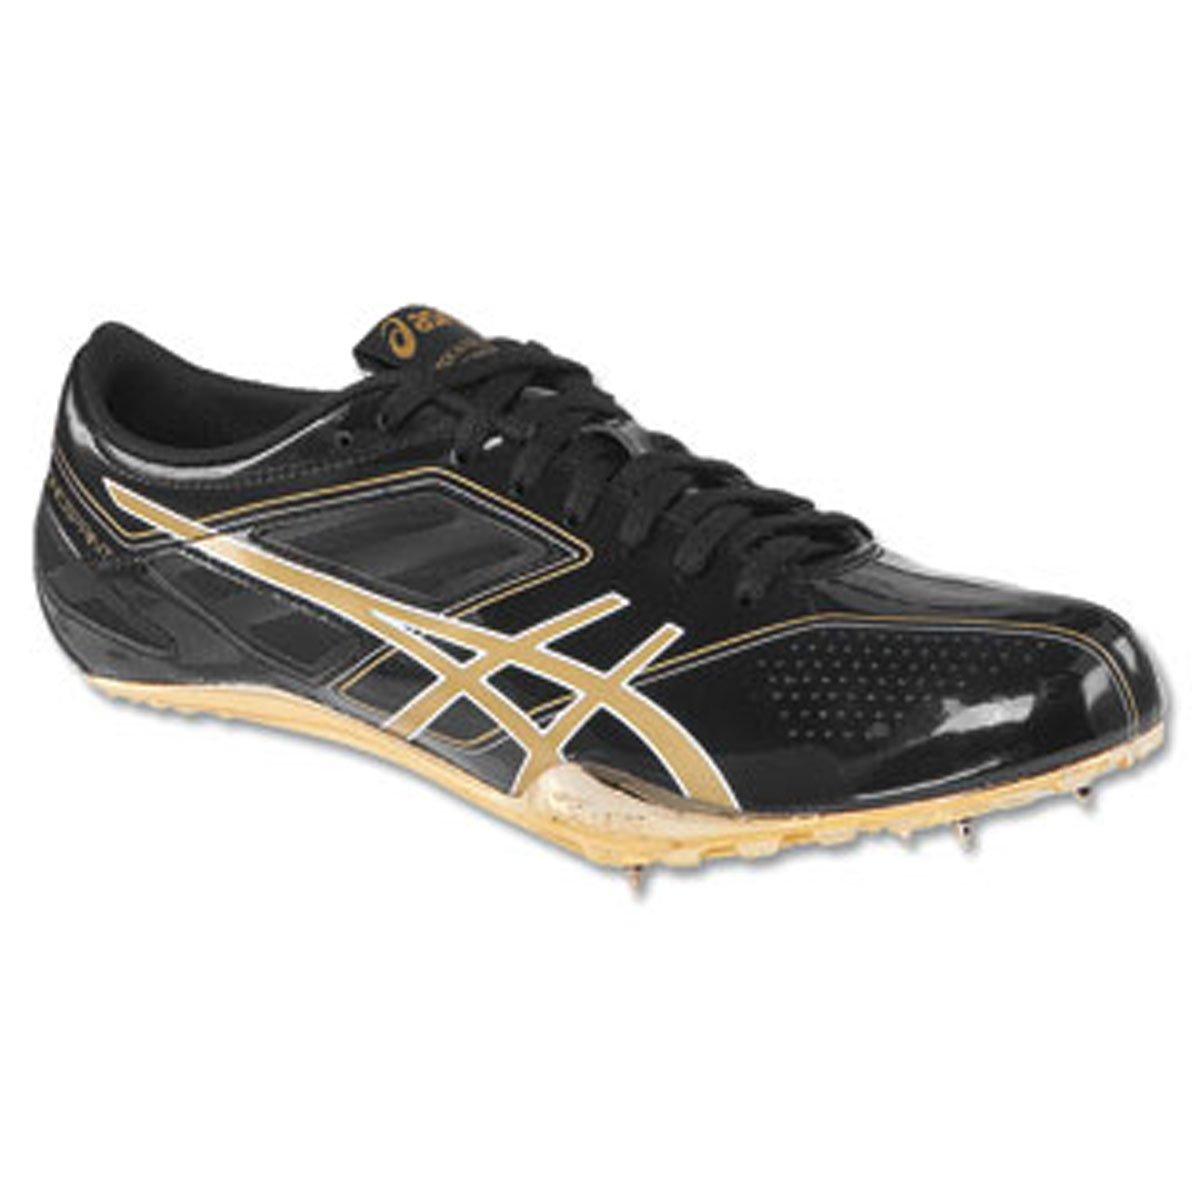 ASICS Men's Sonicsprint Track and Field Shoe ASICS America Corporation Sonicsprint-M